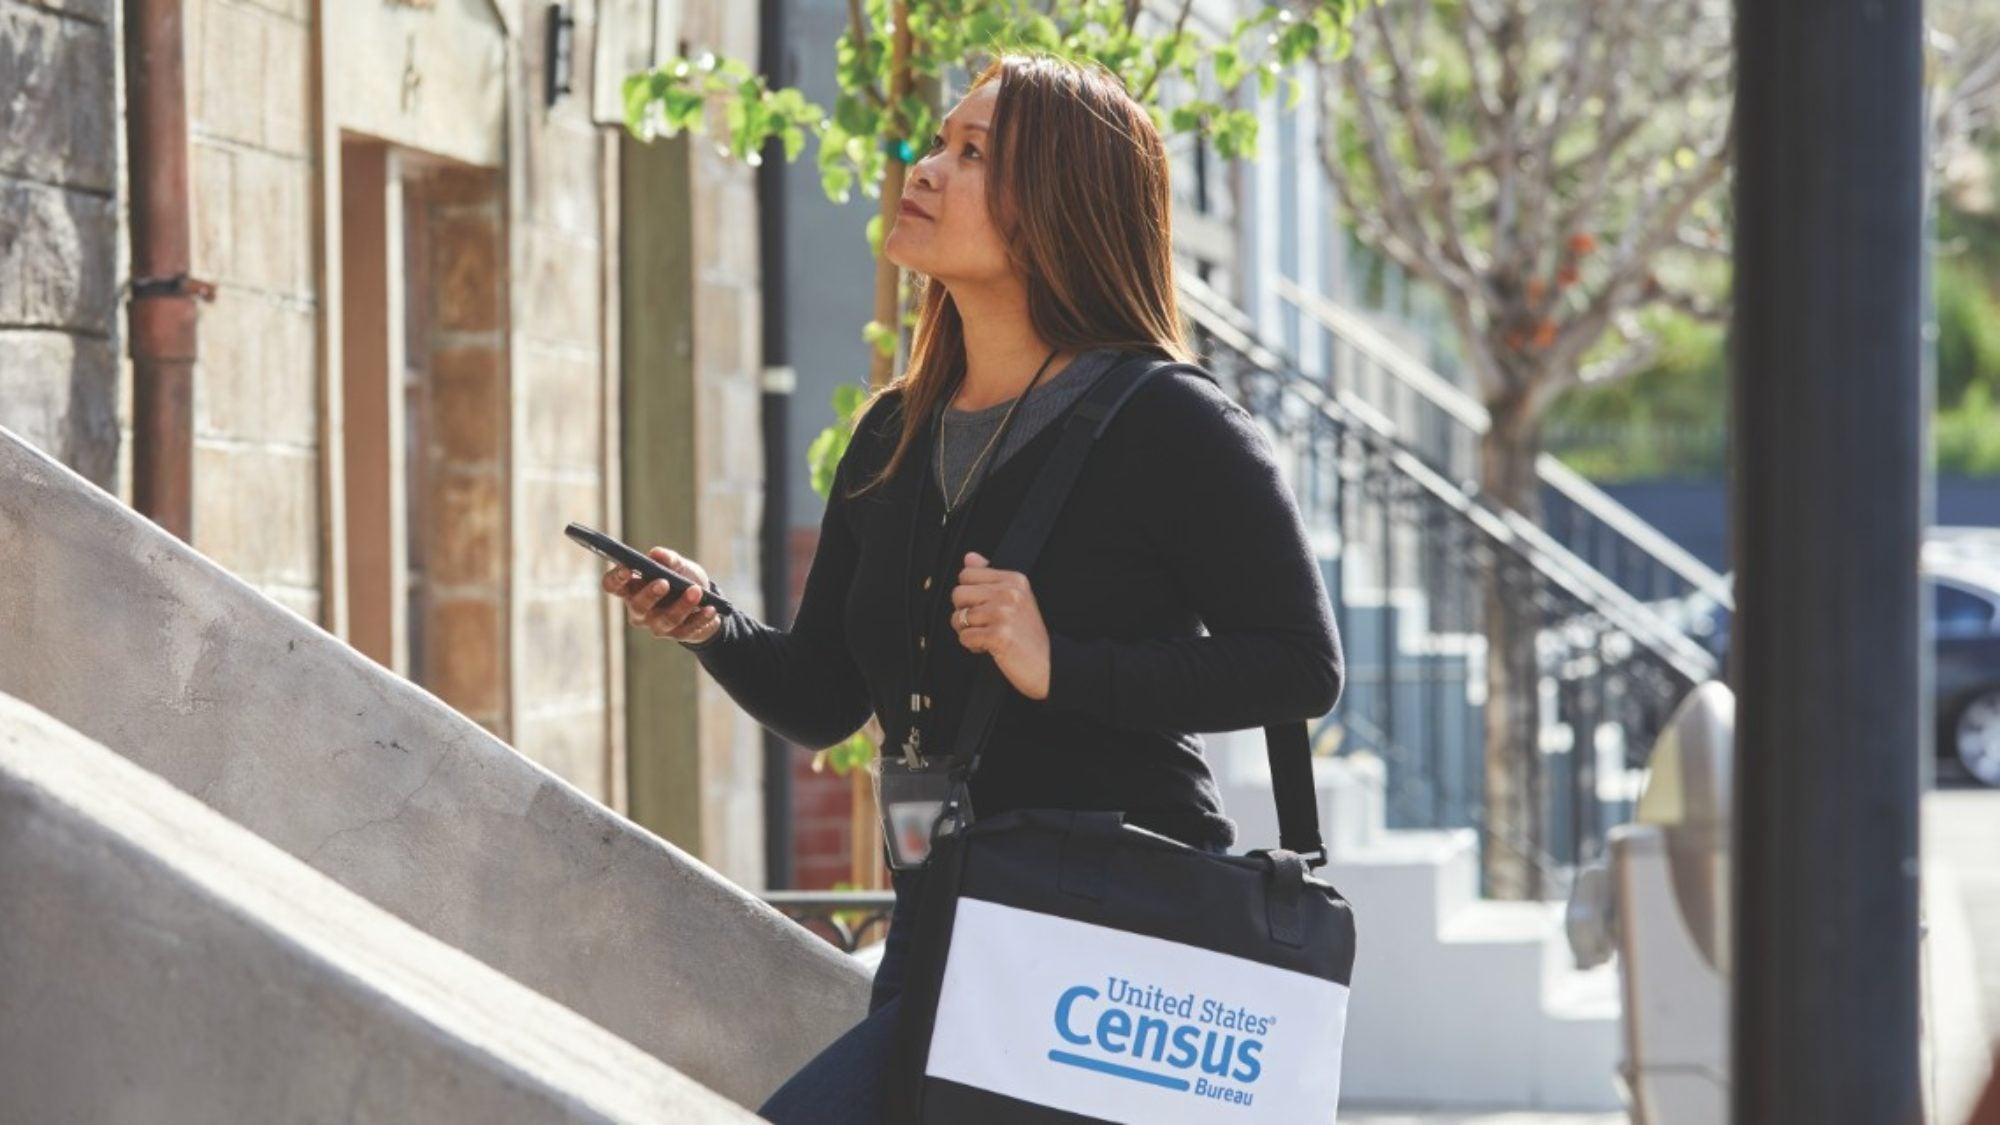 Census worker walking upstairs